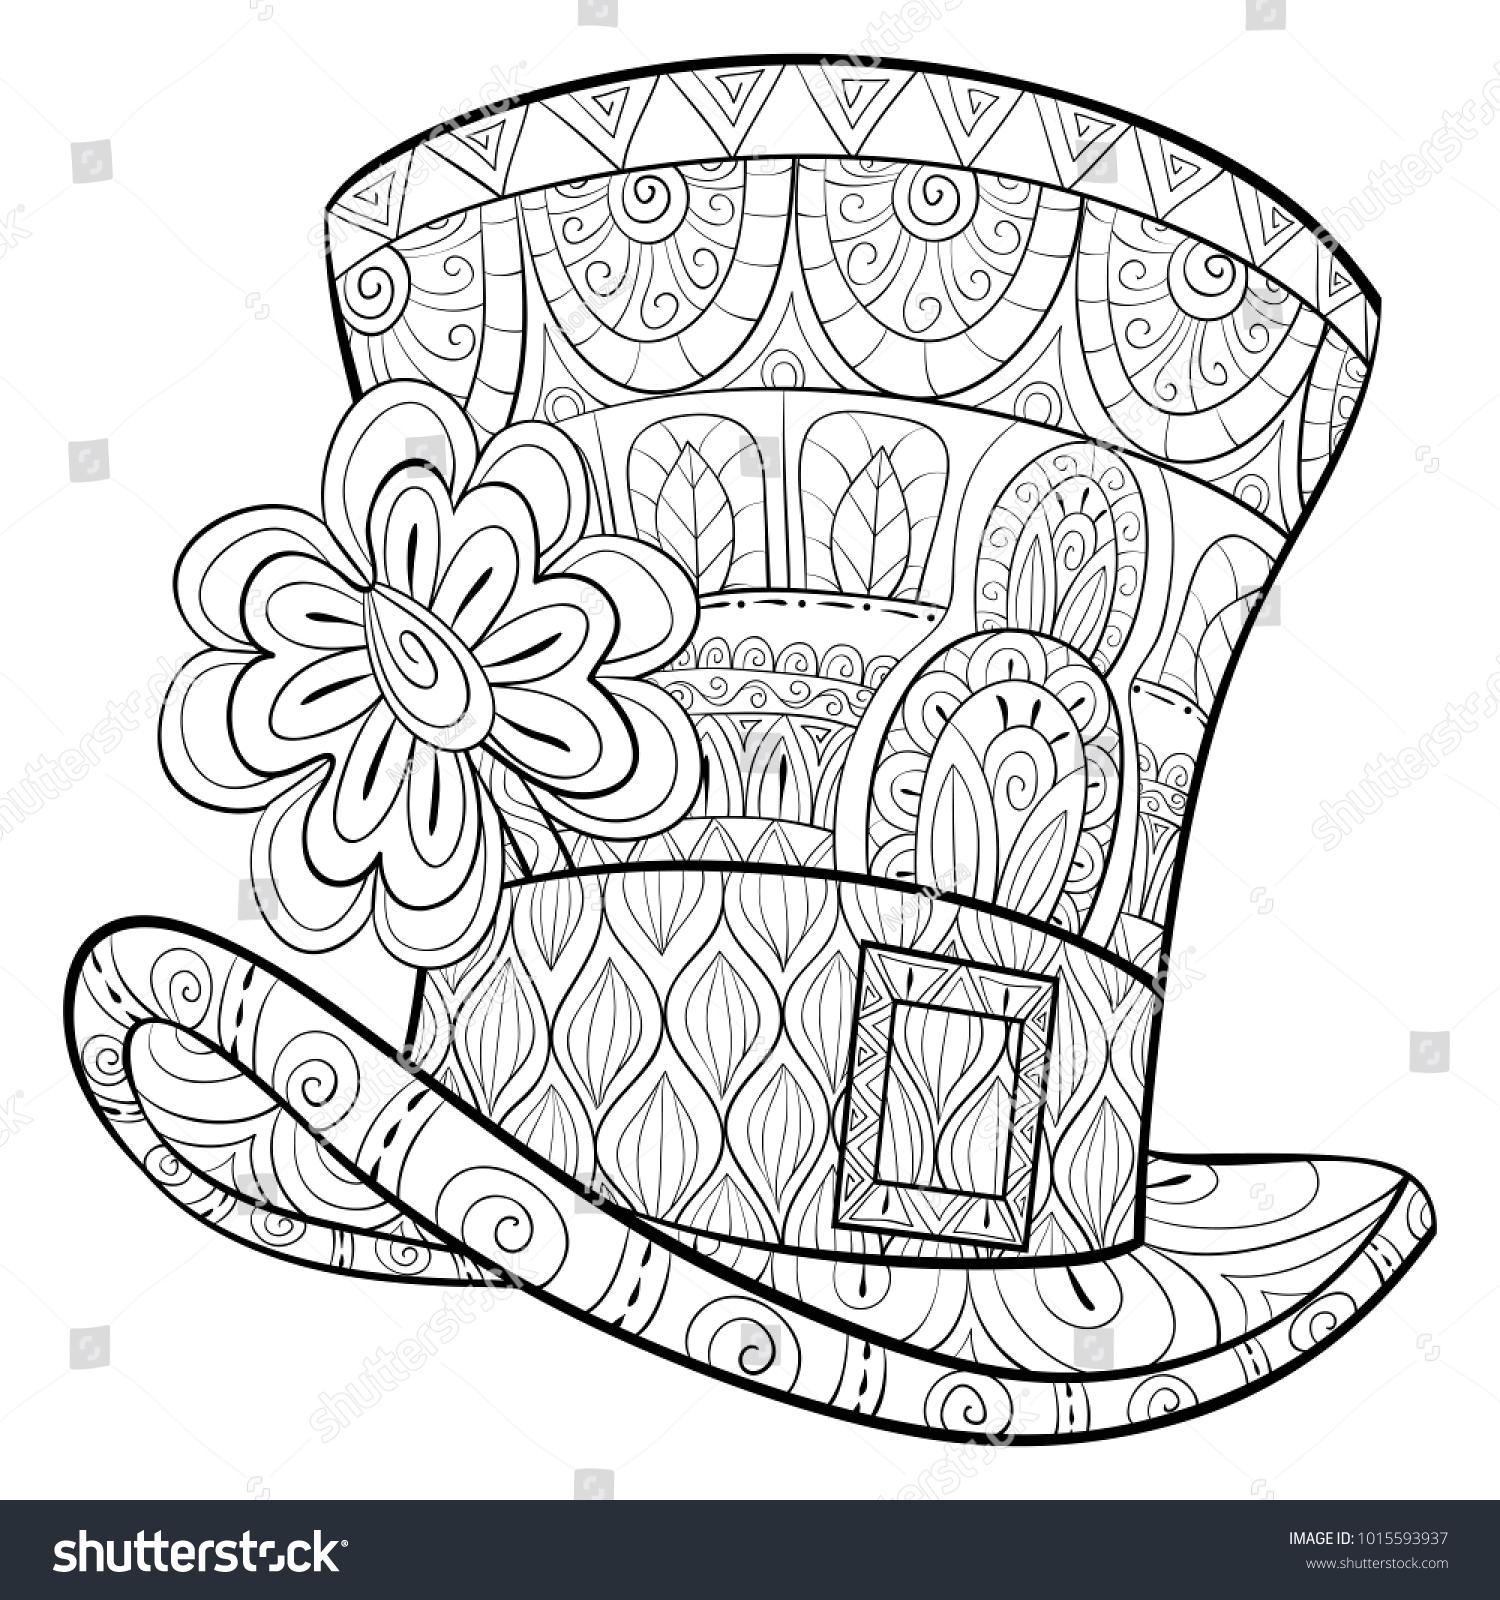 Adult Coloring Pagebook Saint Patrick Hat Stock Vector 1015593937 ...